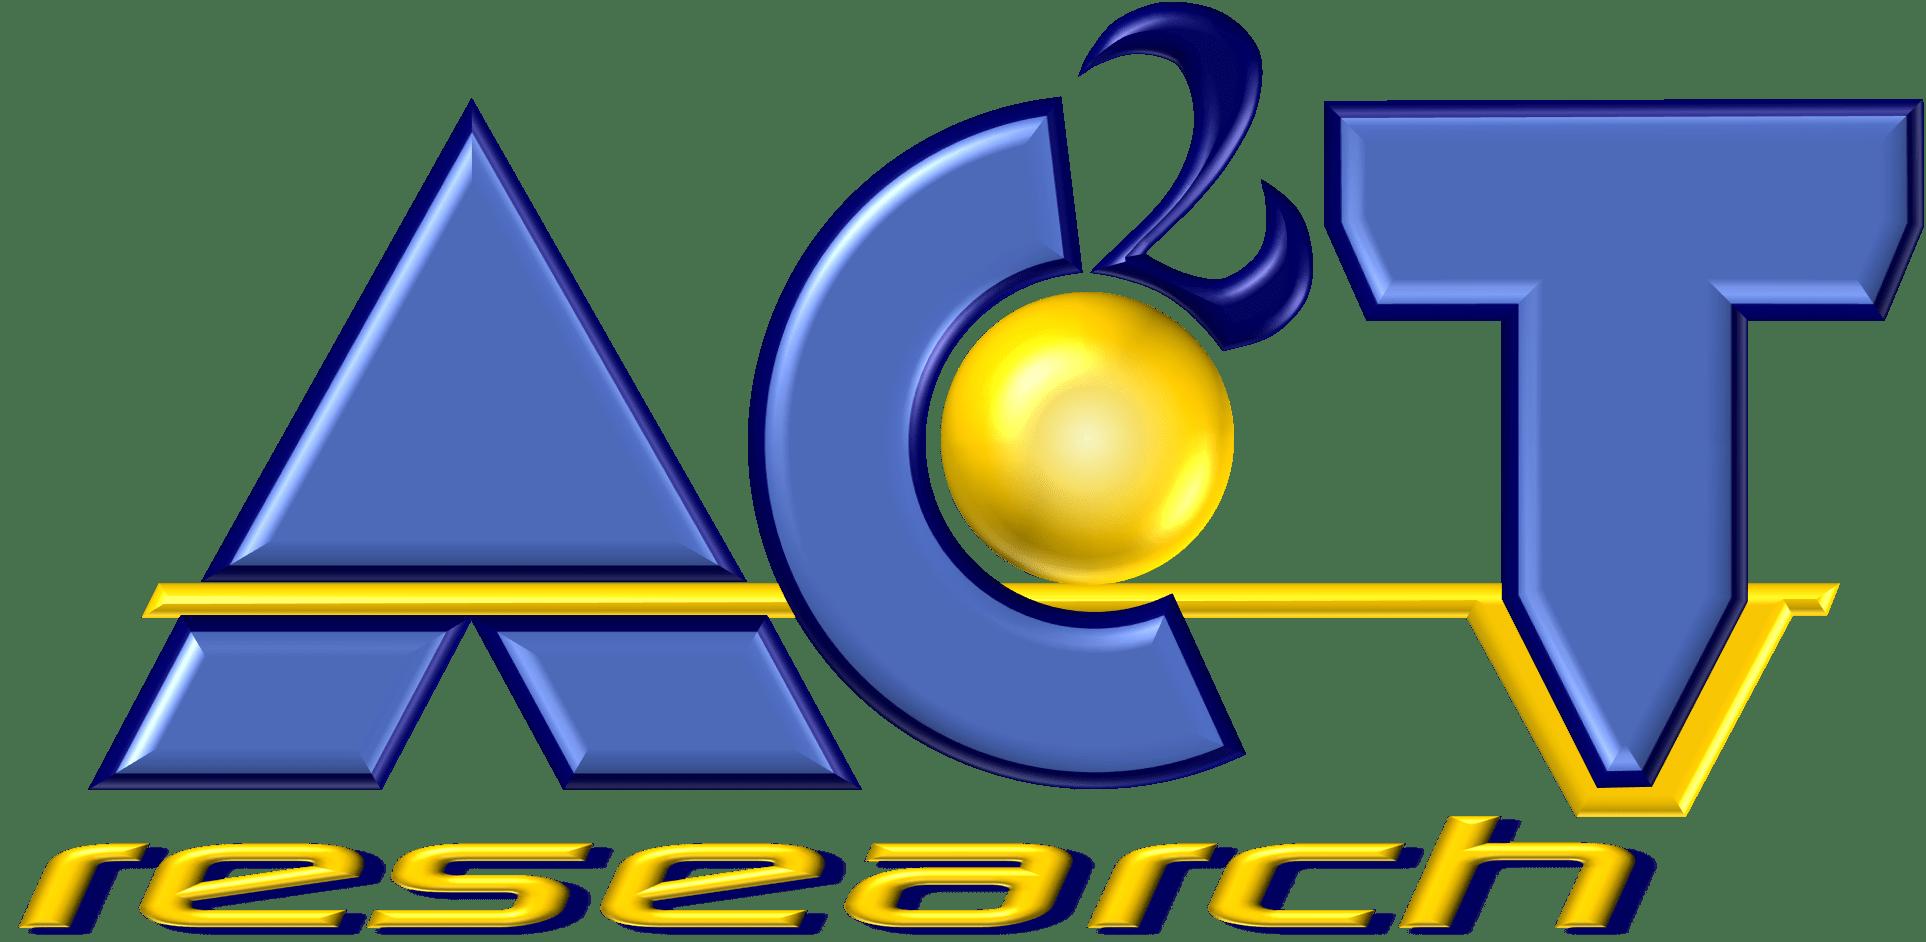 AC2T research GmbH